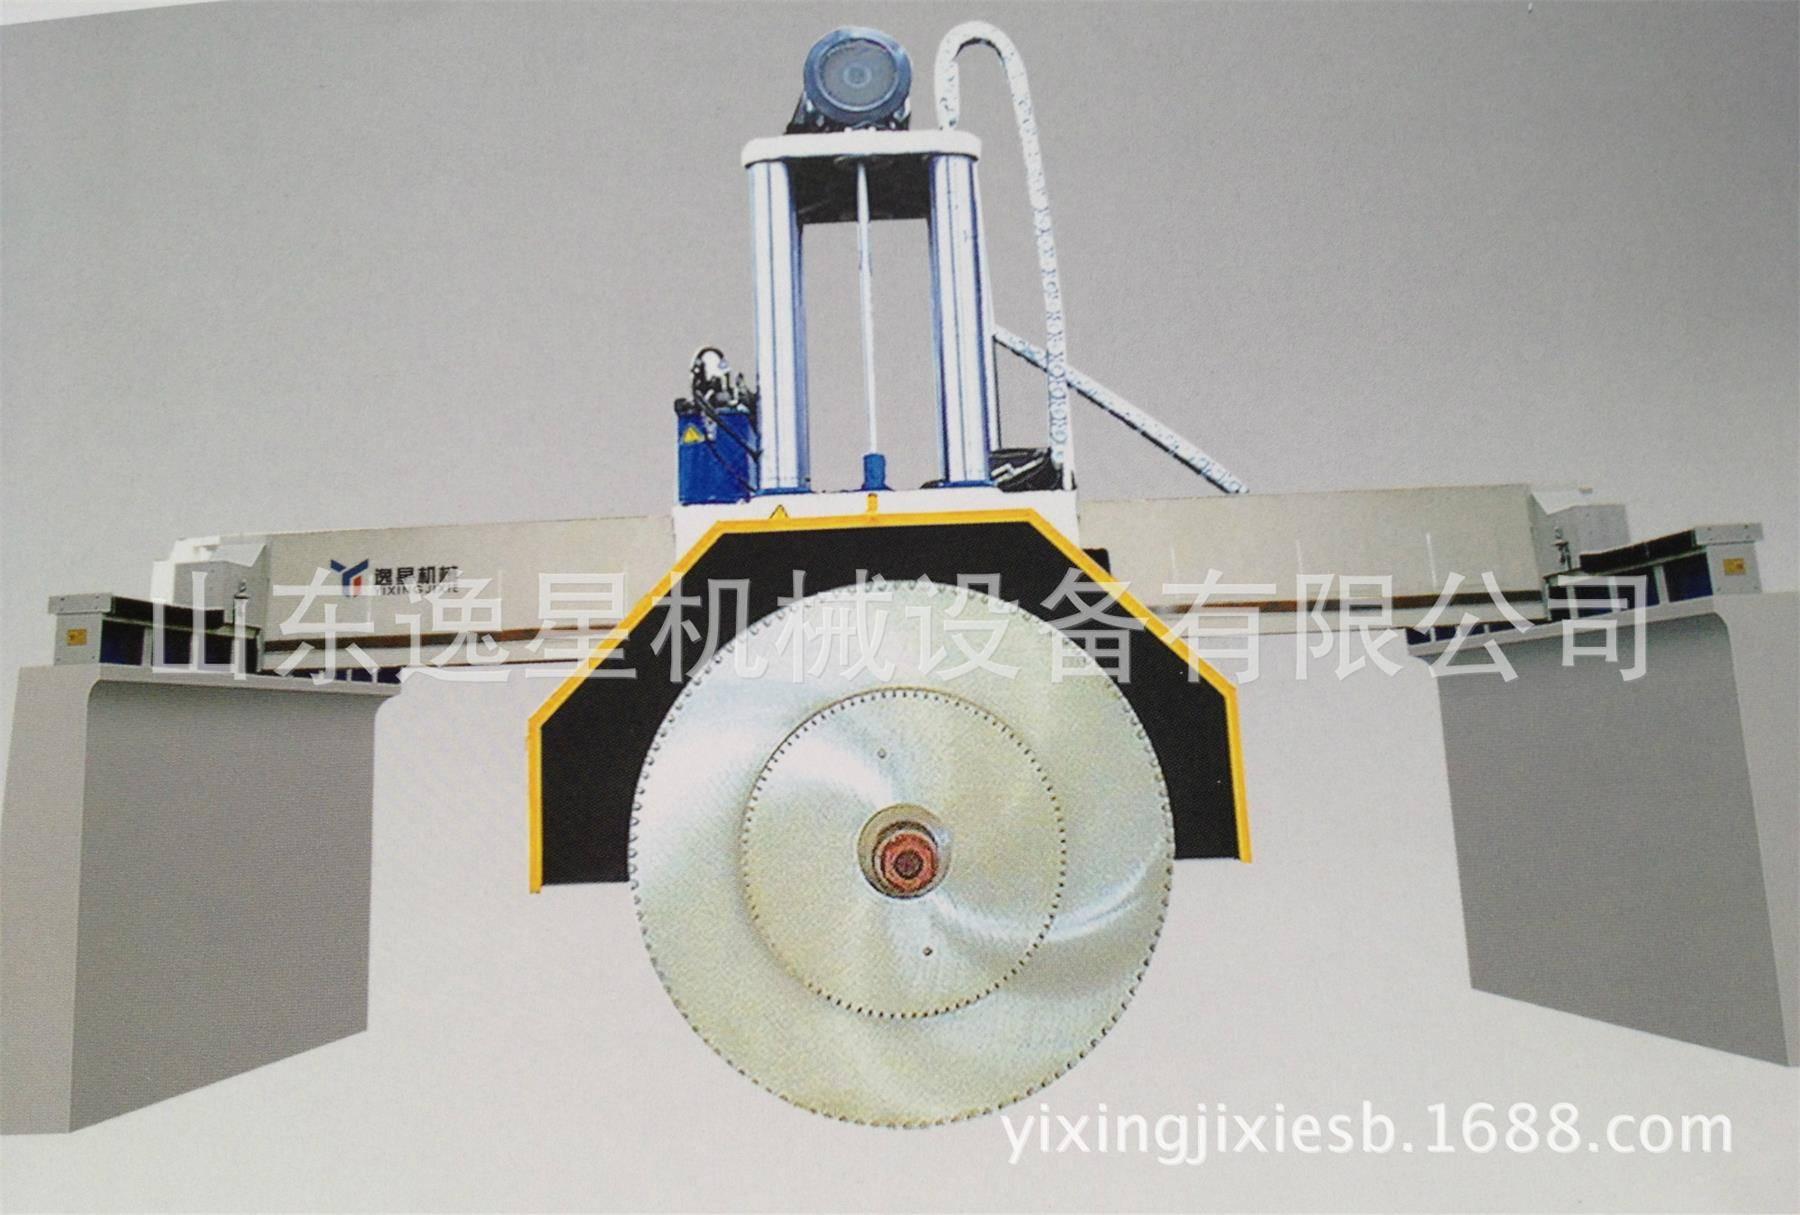 HSGJ-1600 double locking bridge cutting machine